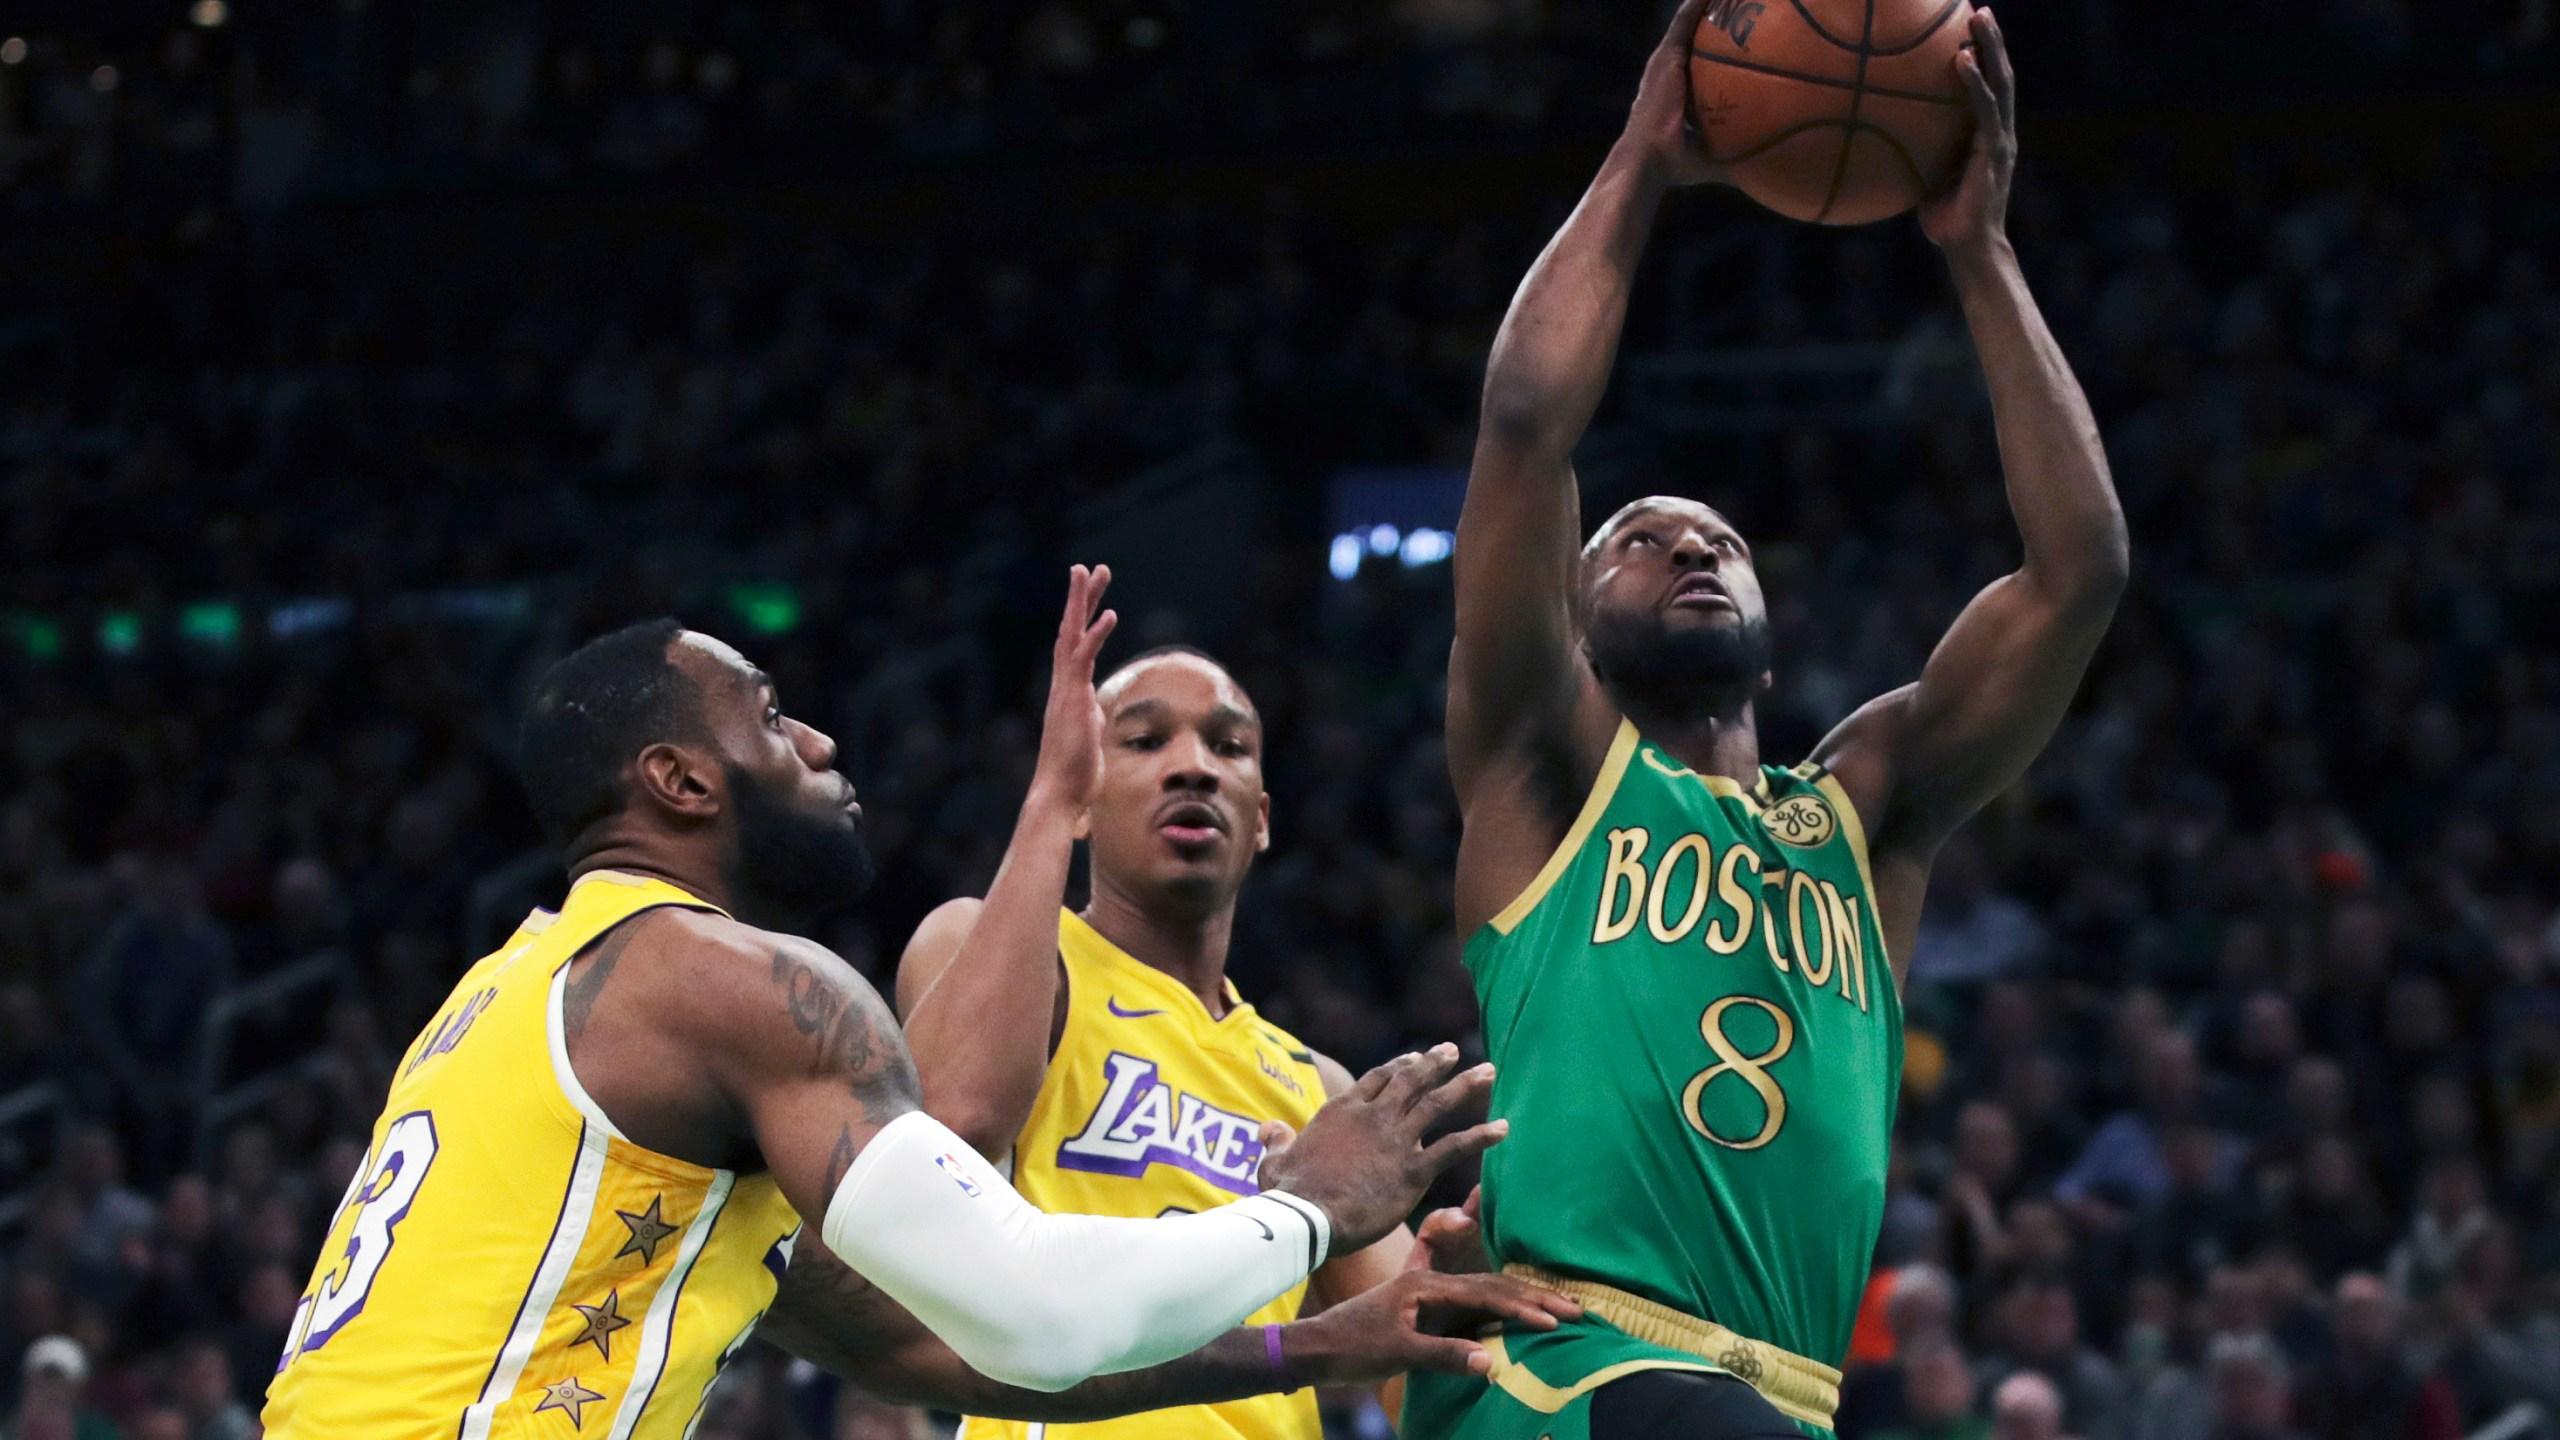 Kemba Beats Lebron For 1st Time Celtics Top La 139 107 Knwa Fox24